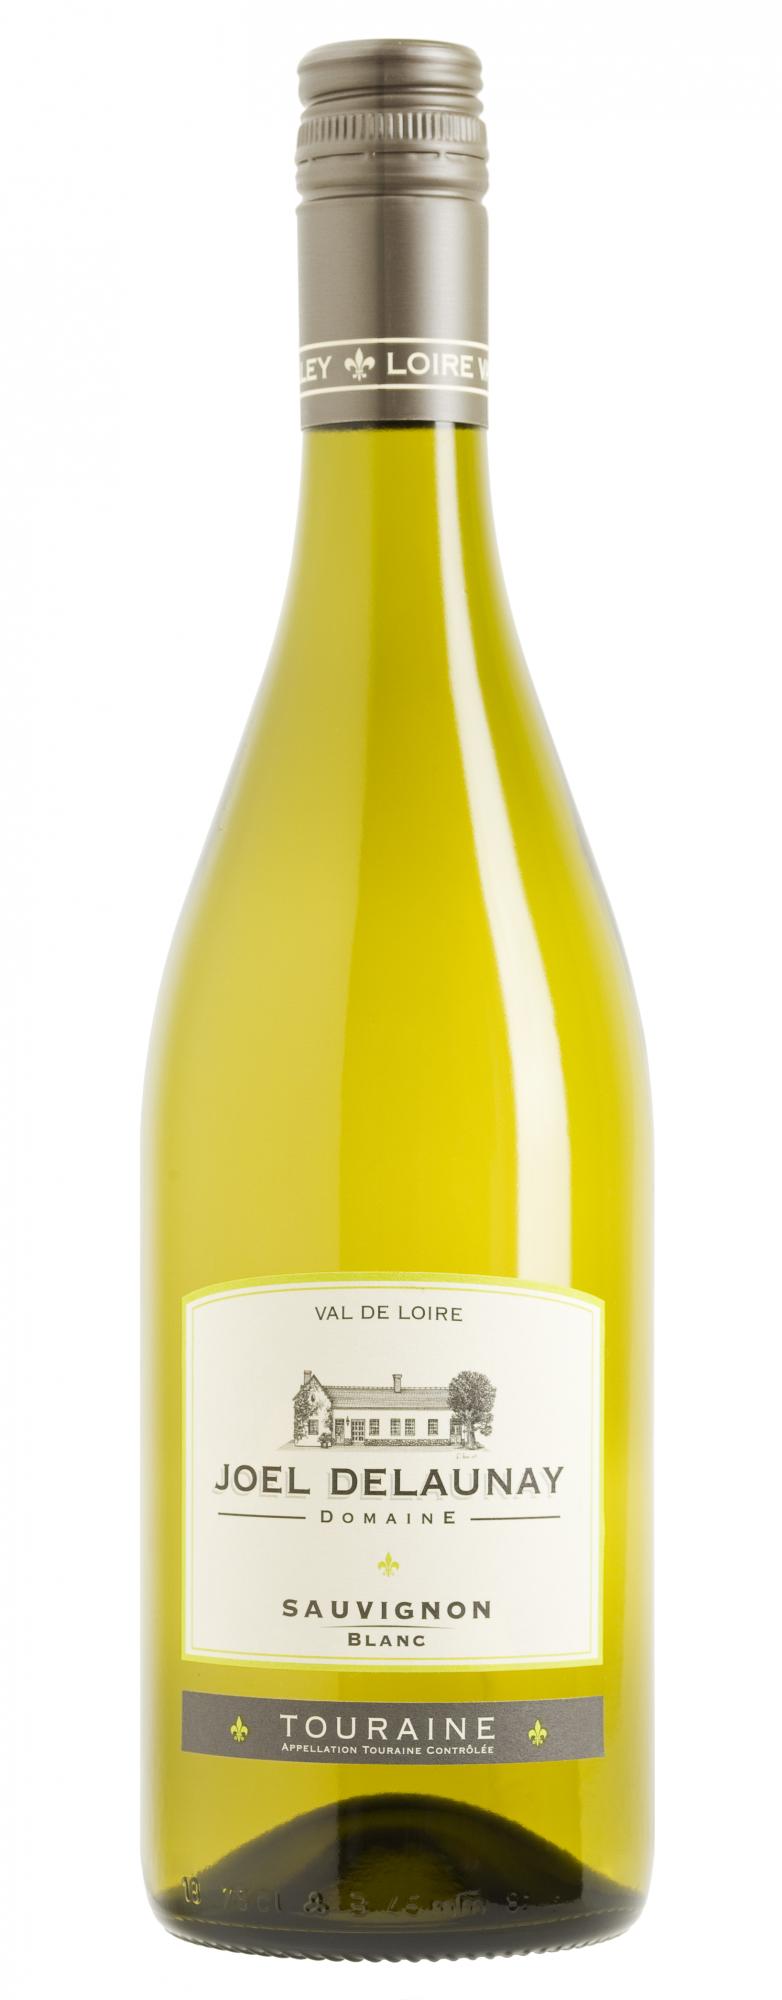 Joël Delaunay Touraine Sauvignon Blanc